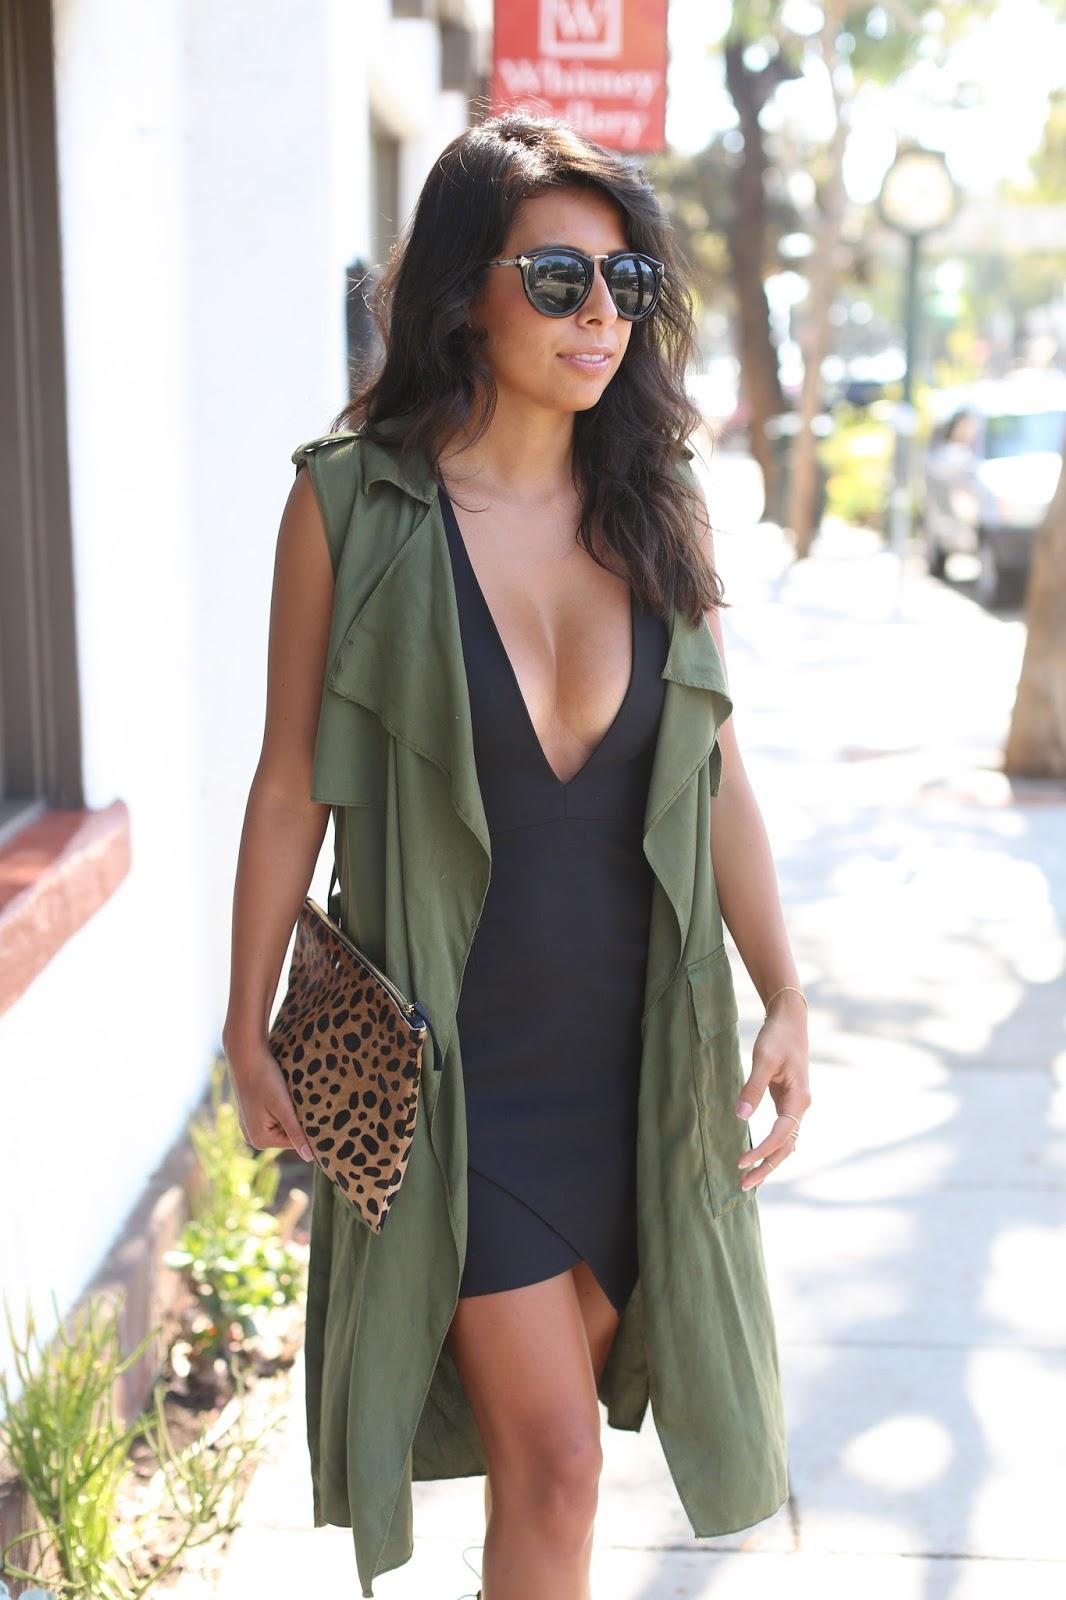 NBD dress, claire vivier leopard clutch, how to wear little black dress